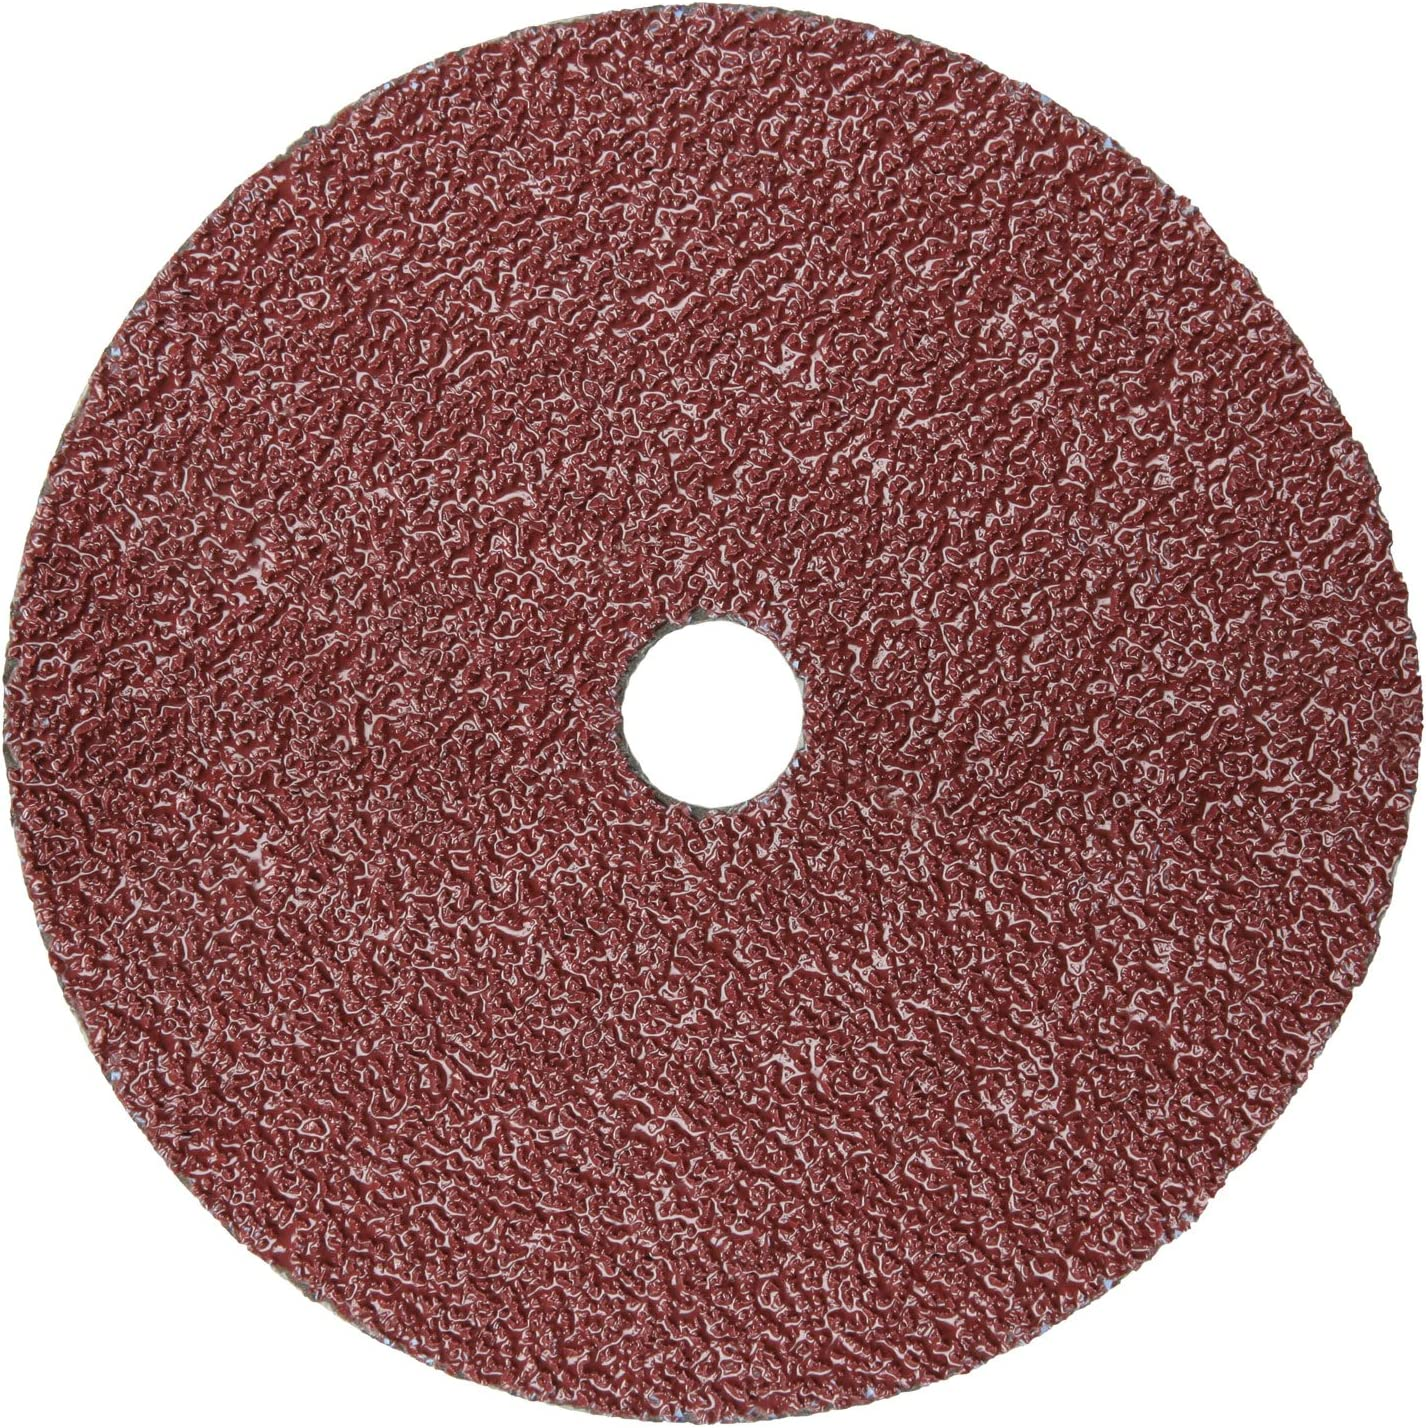 9-1//8 x 7//8 36+ Grit 3M Fiber Disc 982C Precision Shaped Ceramic Grain